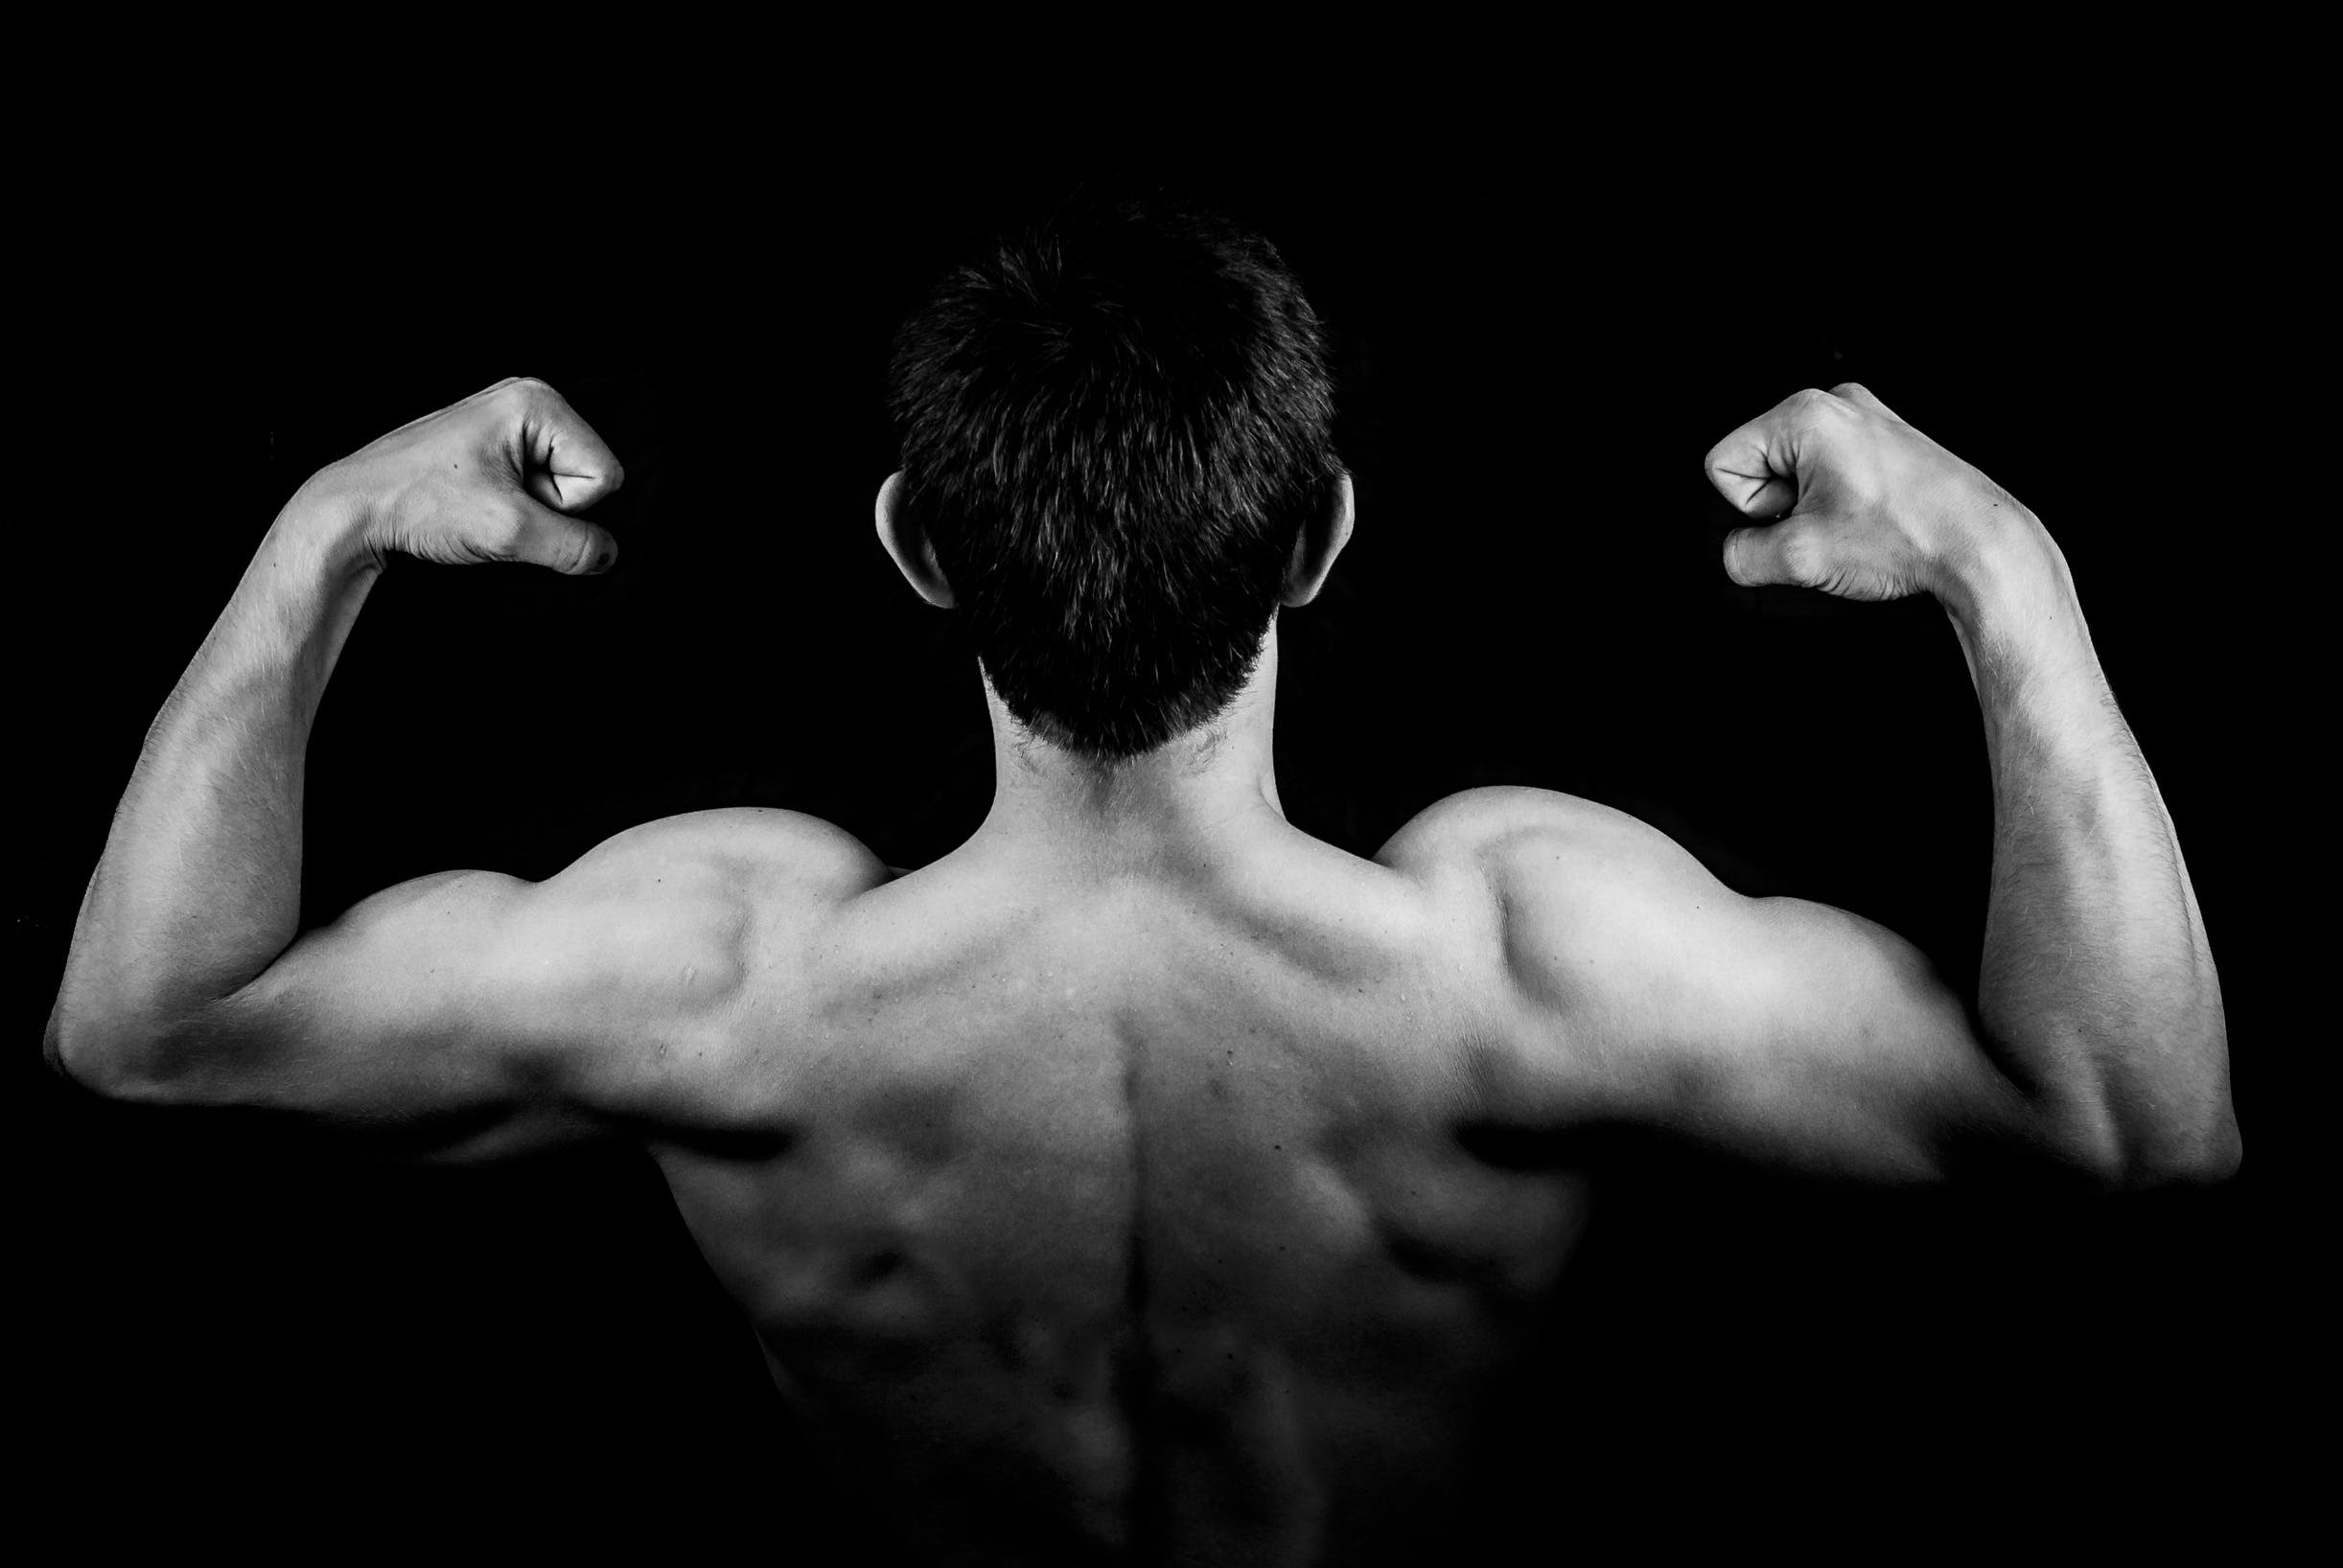 Gratis arkivbilde med biceps, bodybuilder, bodybuilding, kropp